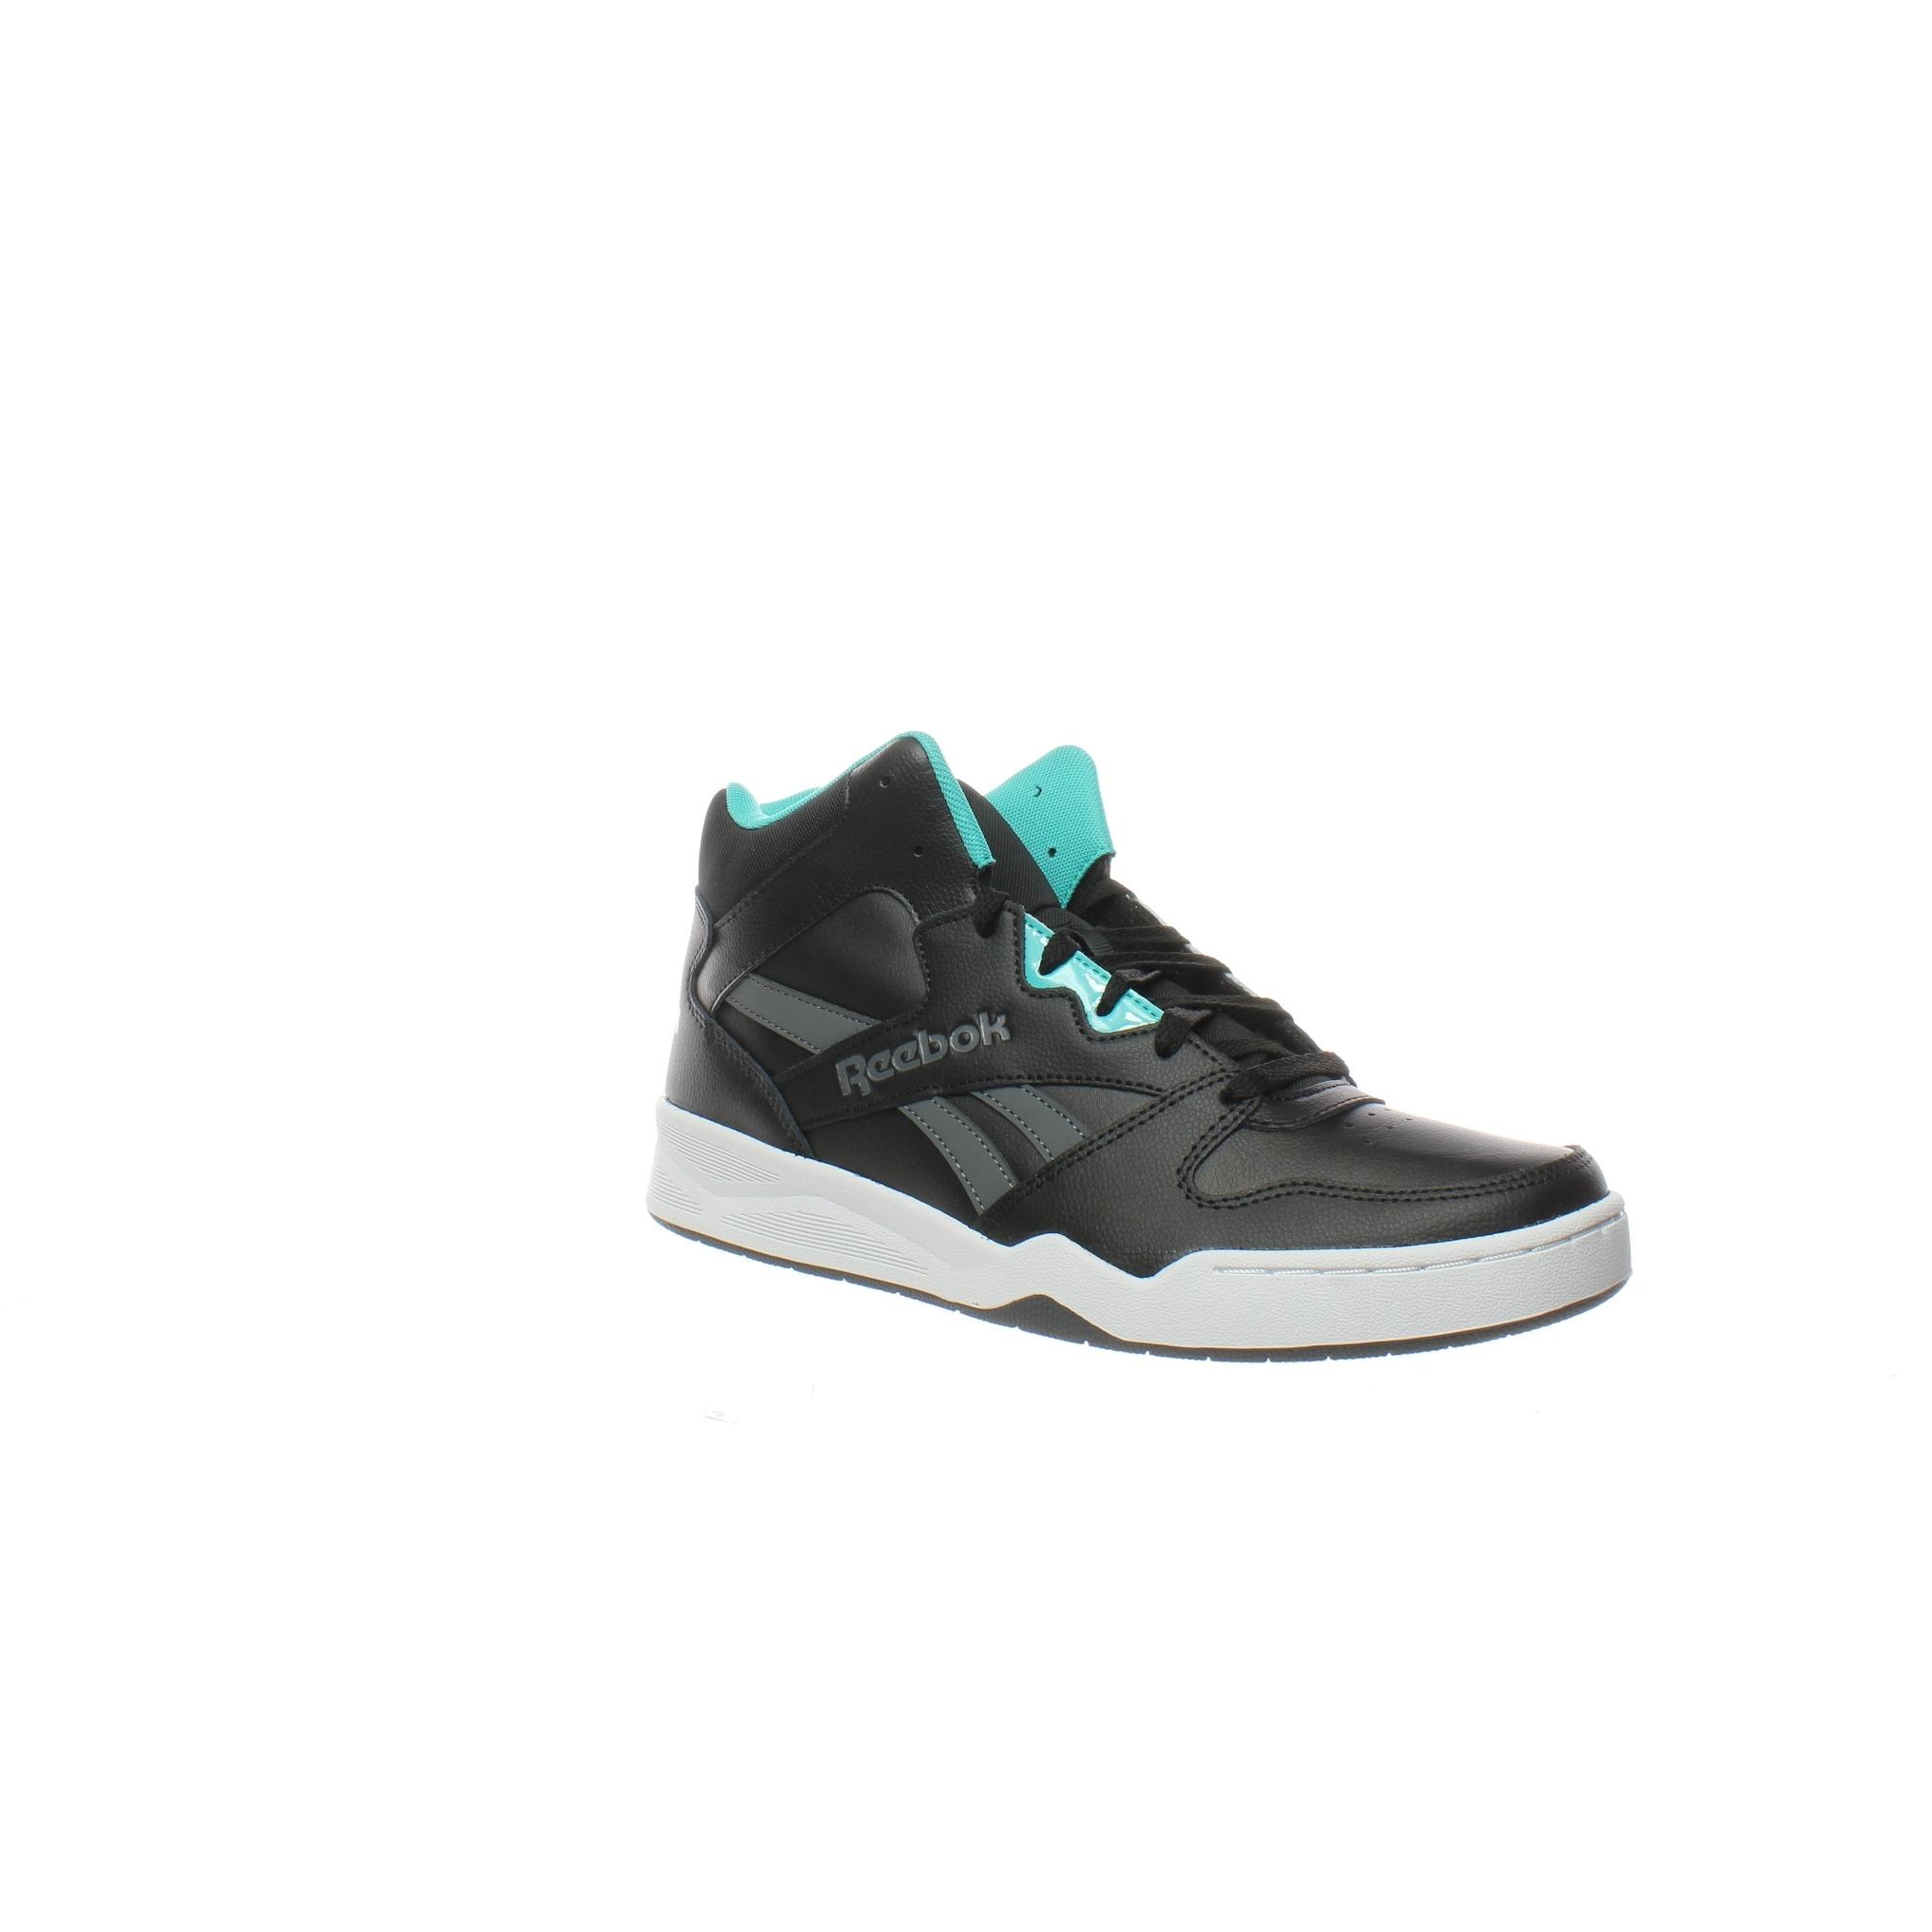 Reebok Mens Royal Bb4500 Hi2 Black Basketball Shoes Size 7.5